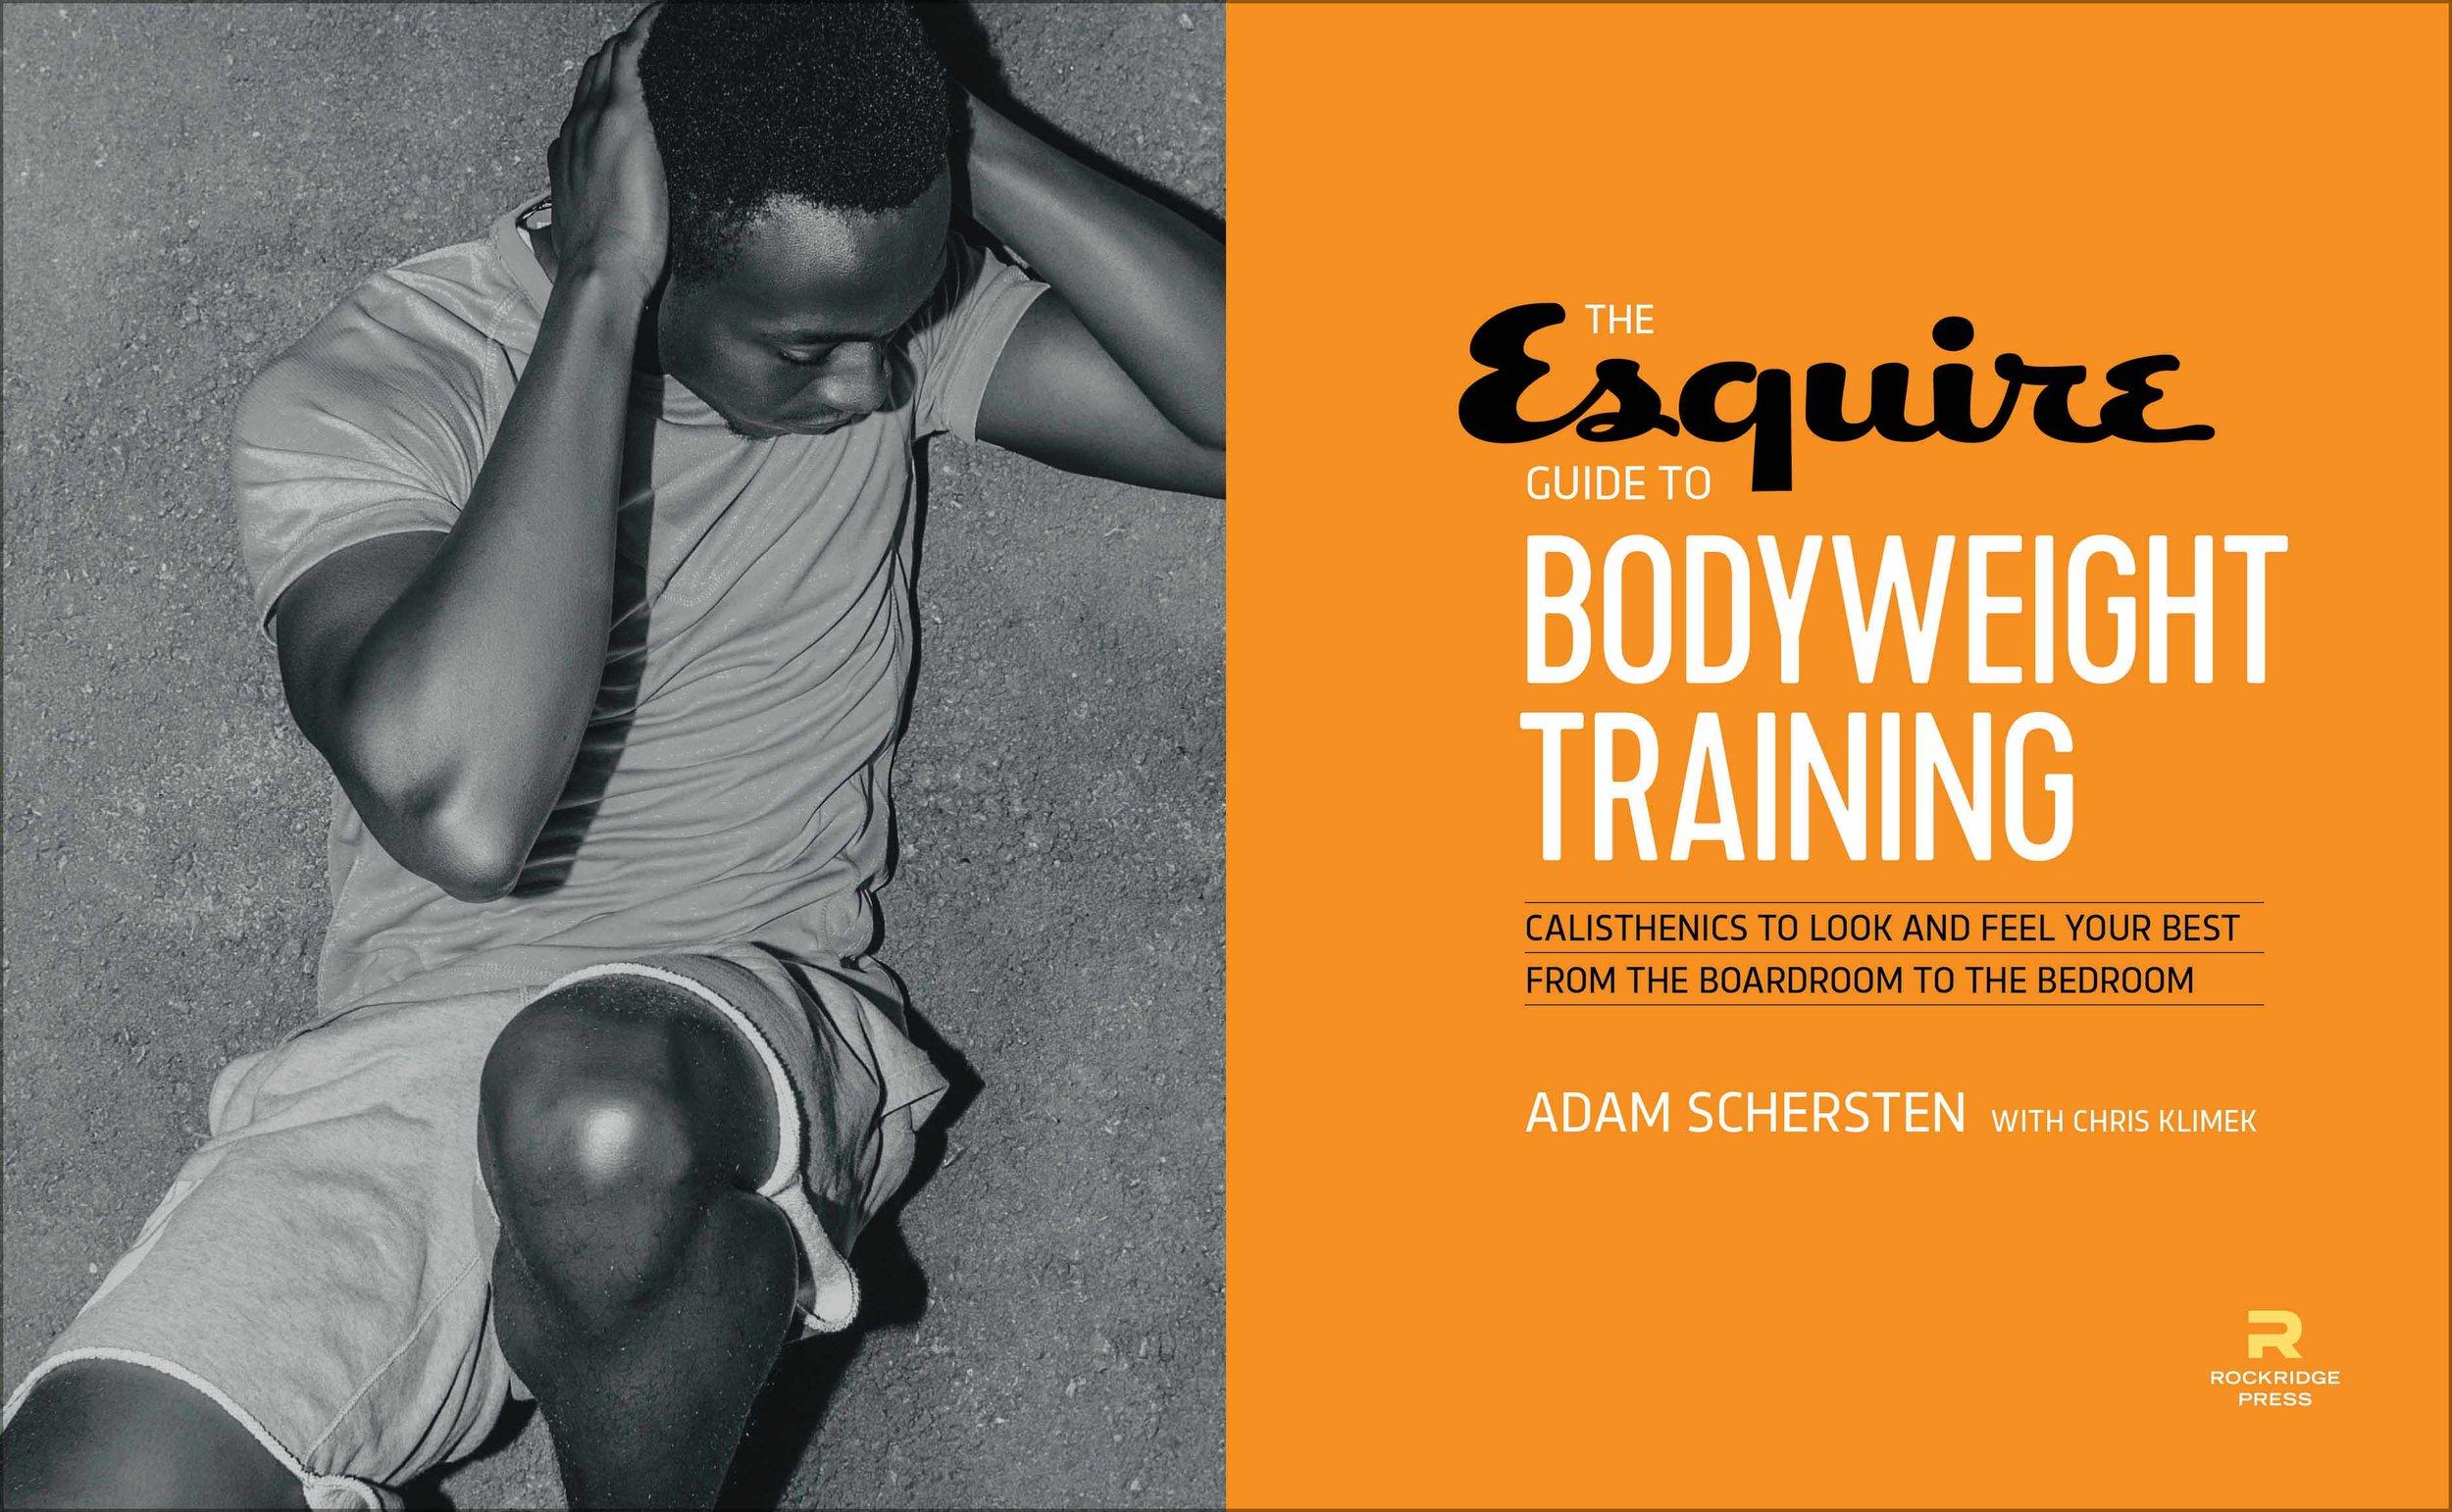 esquire-bodyweight-training-1.jpg